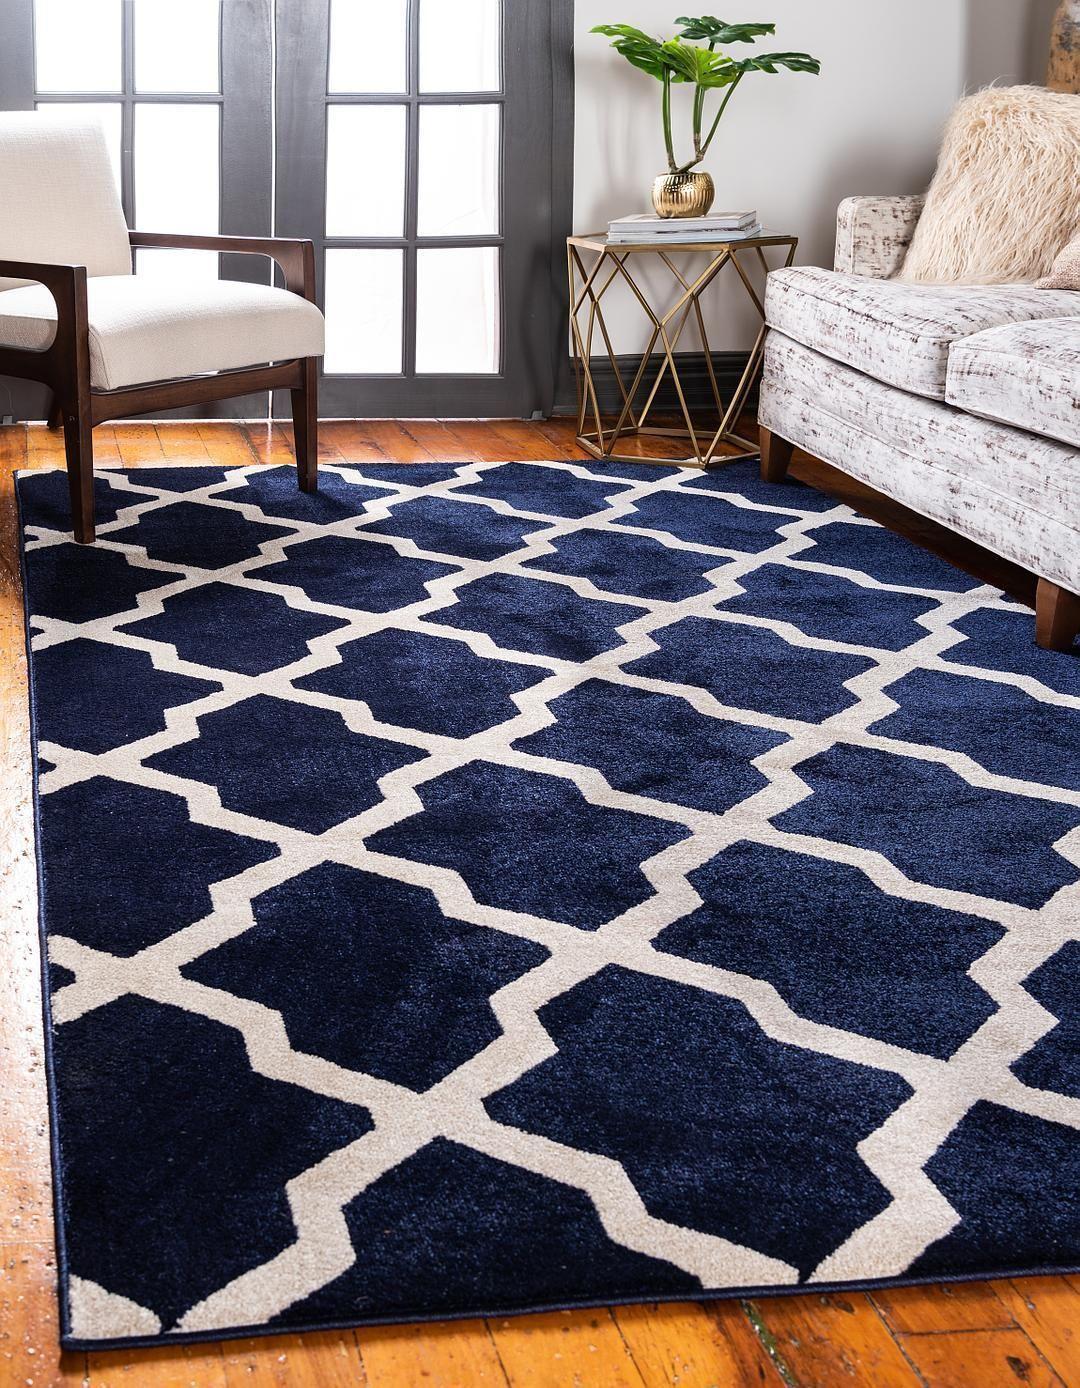 Navy Blue Unique Loom 7 X 10 Trellis Rug Area Rugs Rugs Com Blue Rugs Living Room Navy Rug Living Room Blue Rug Bedroom